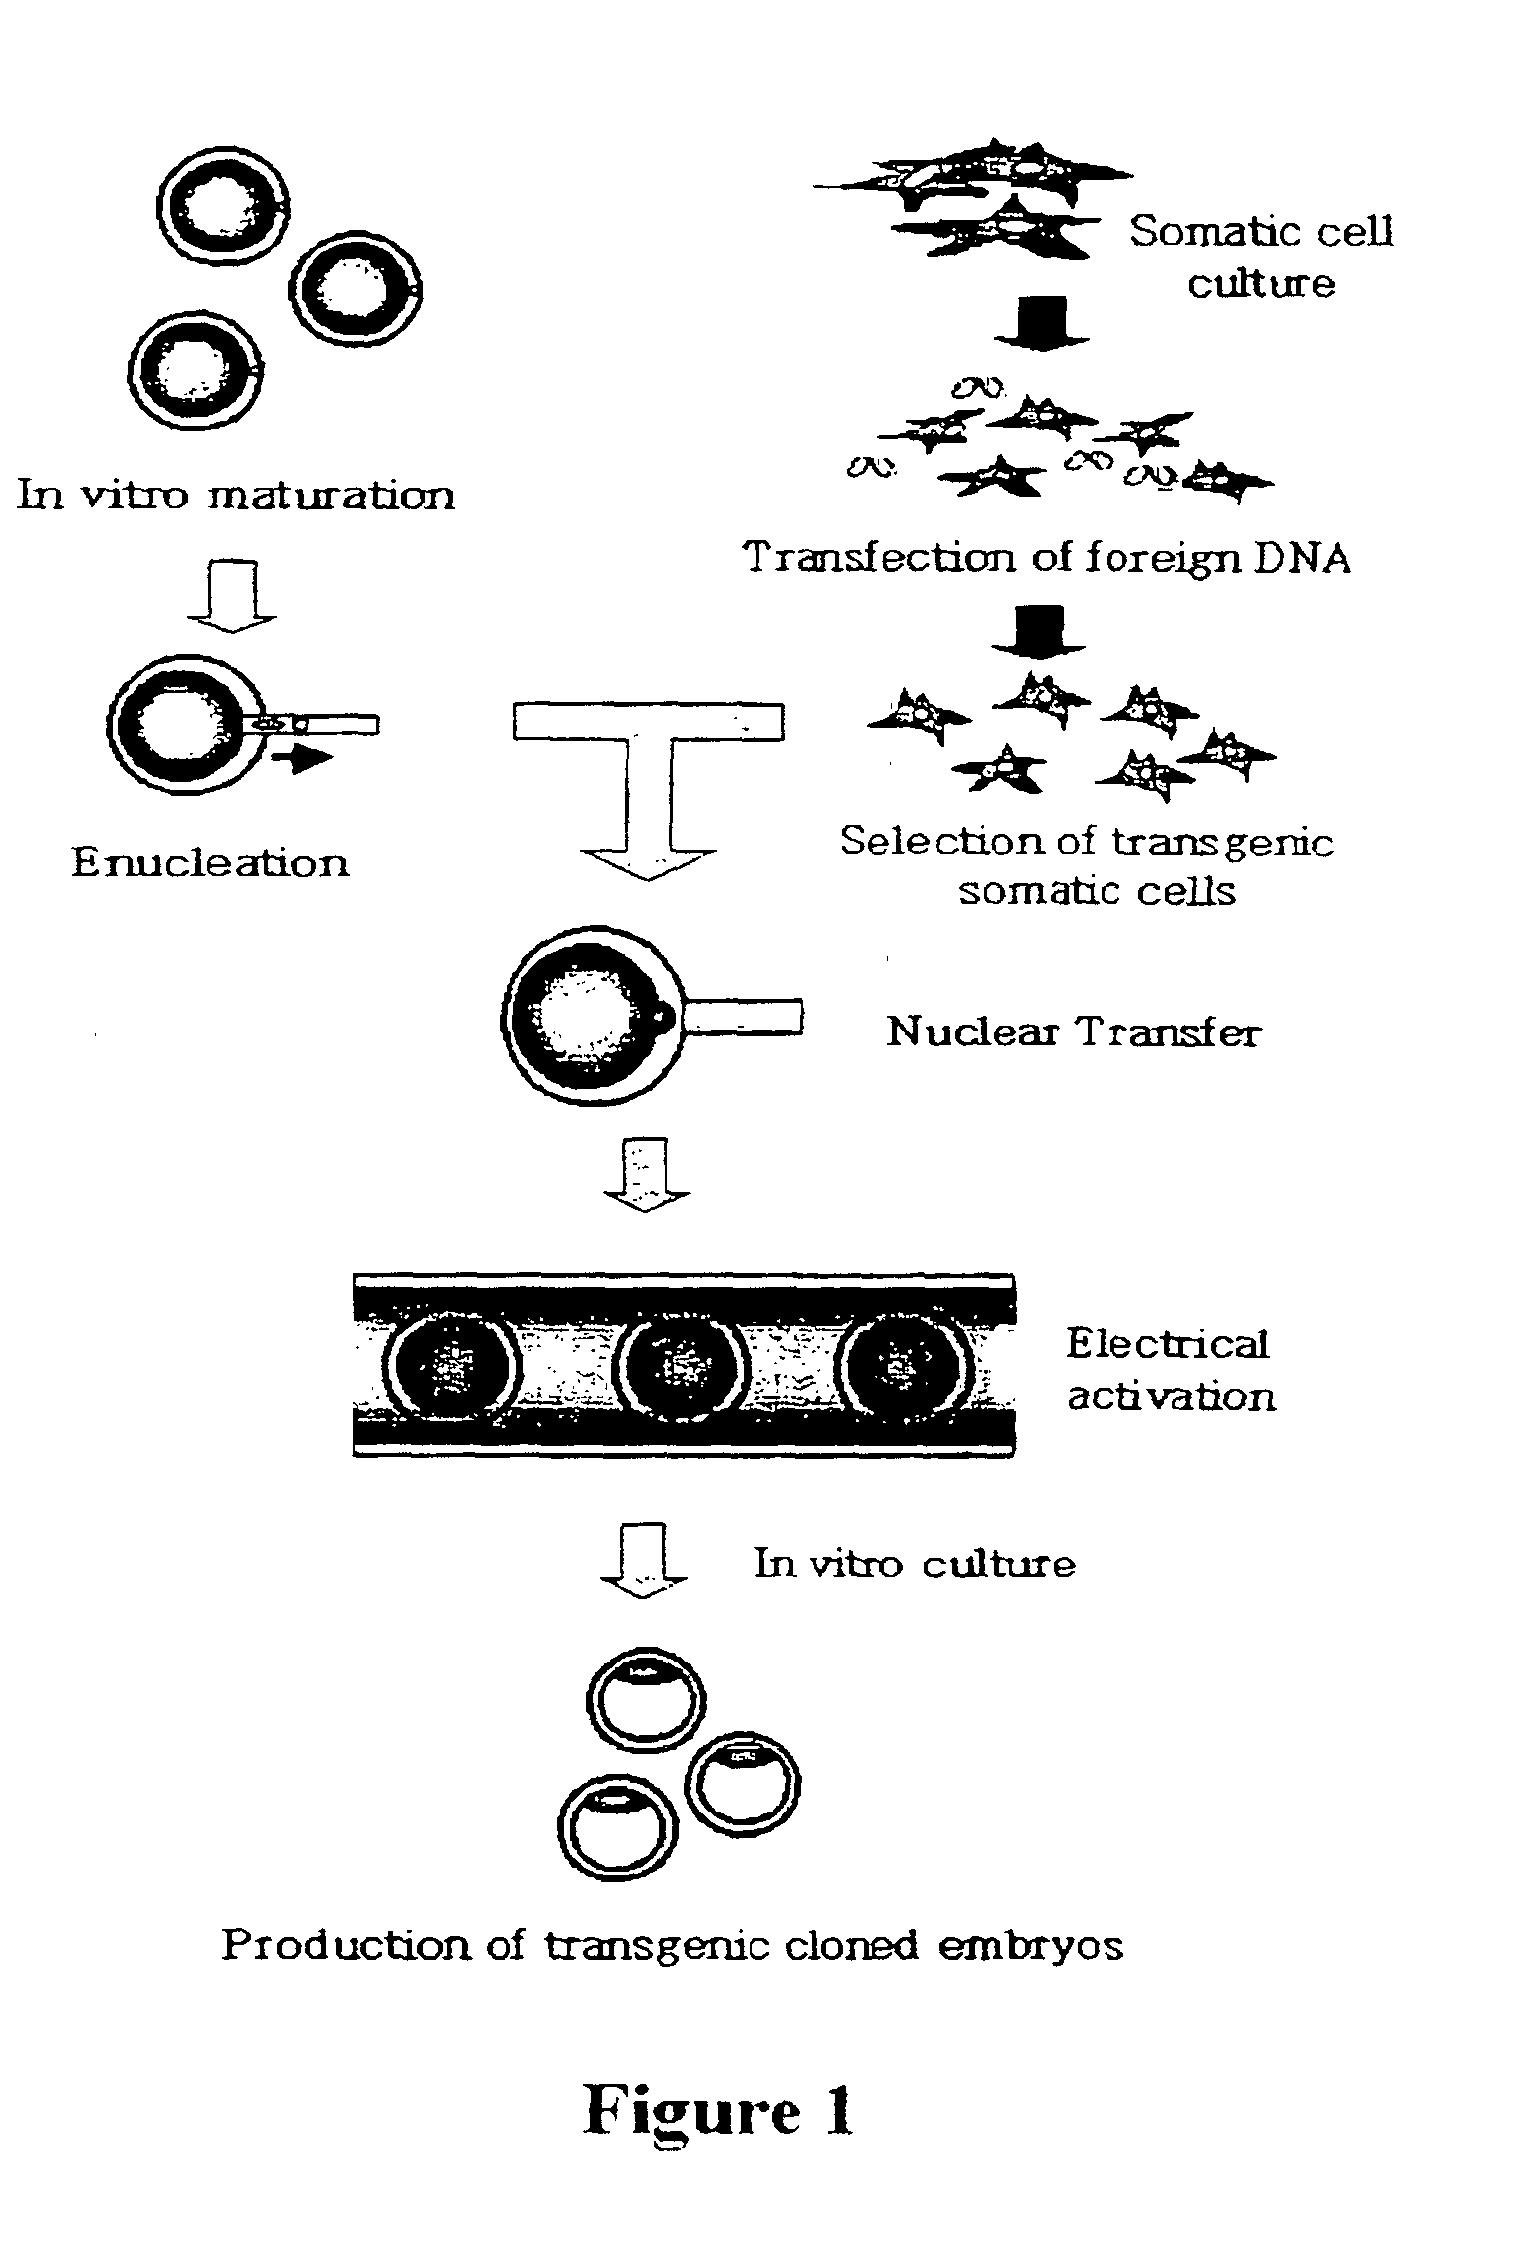 animal cloning diagram viper winch solenoid wiring animals